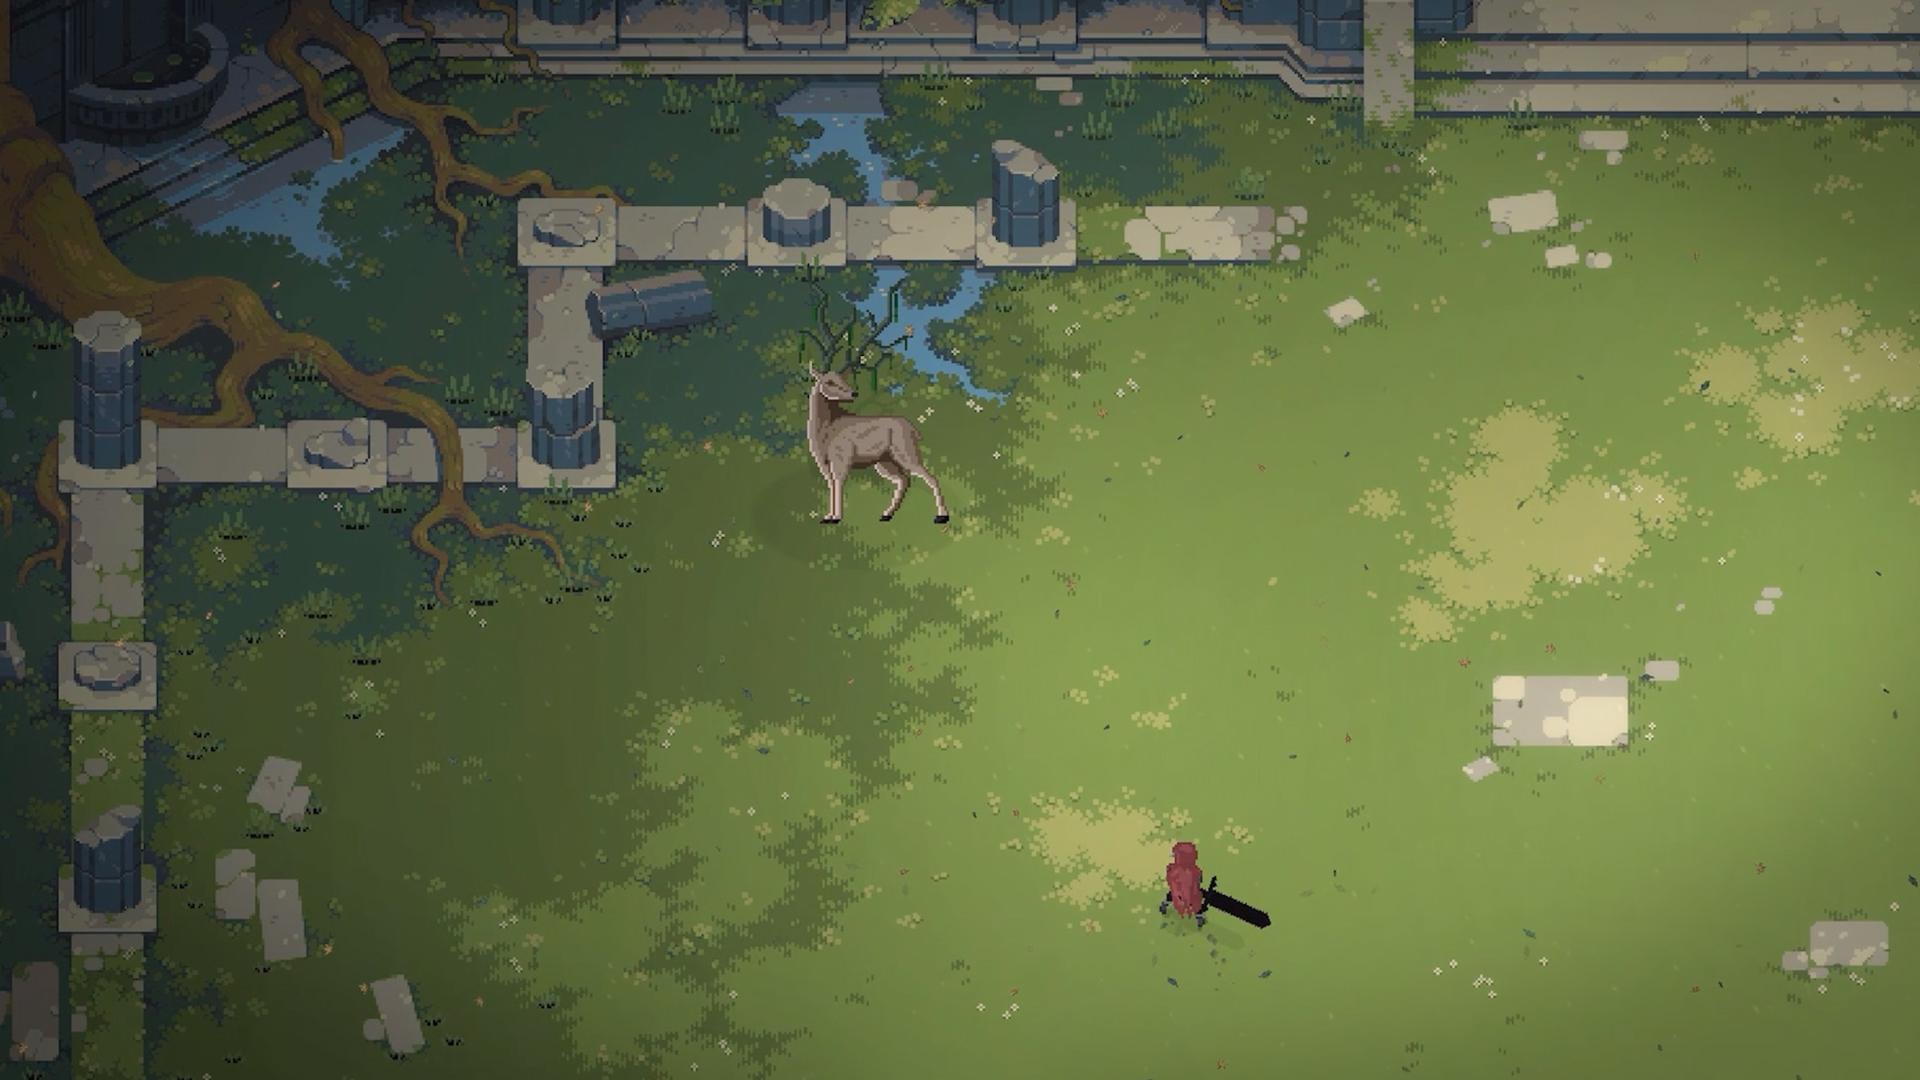 Eldest Souls is a challenging, pixel-art boss-rush game